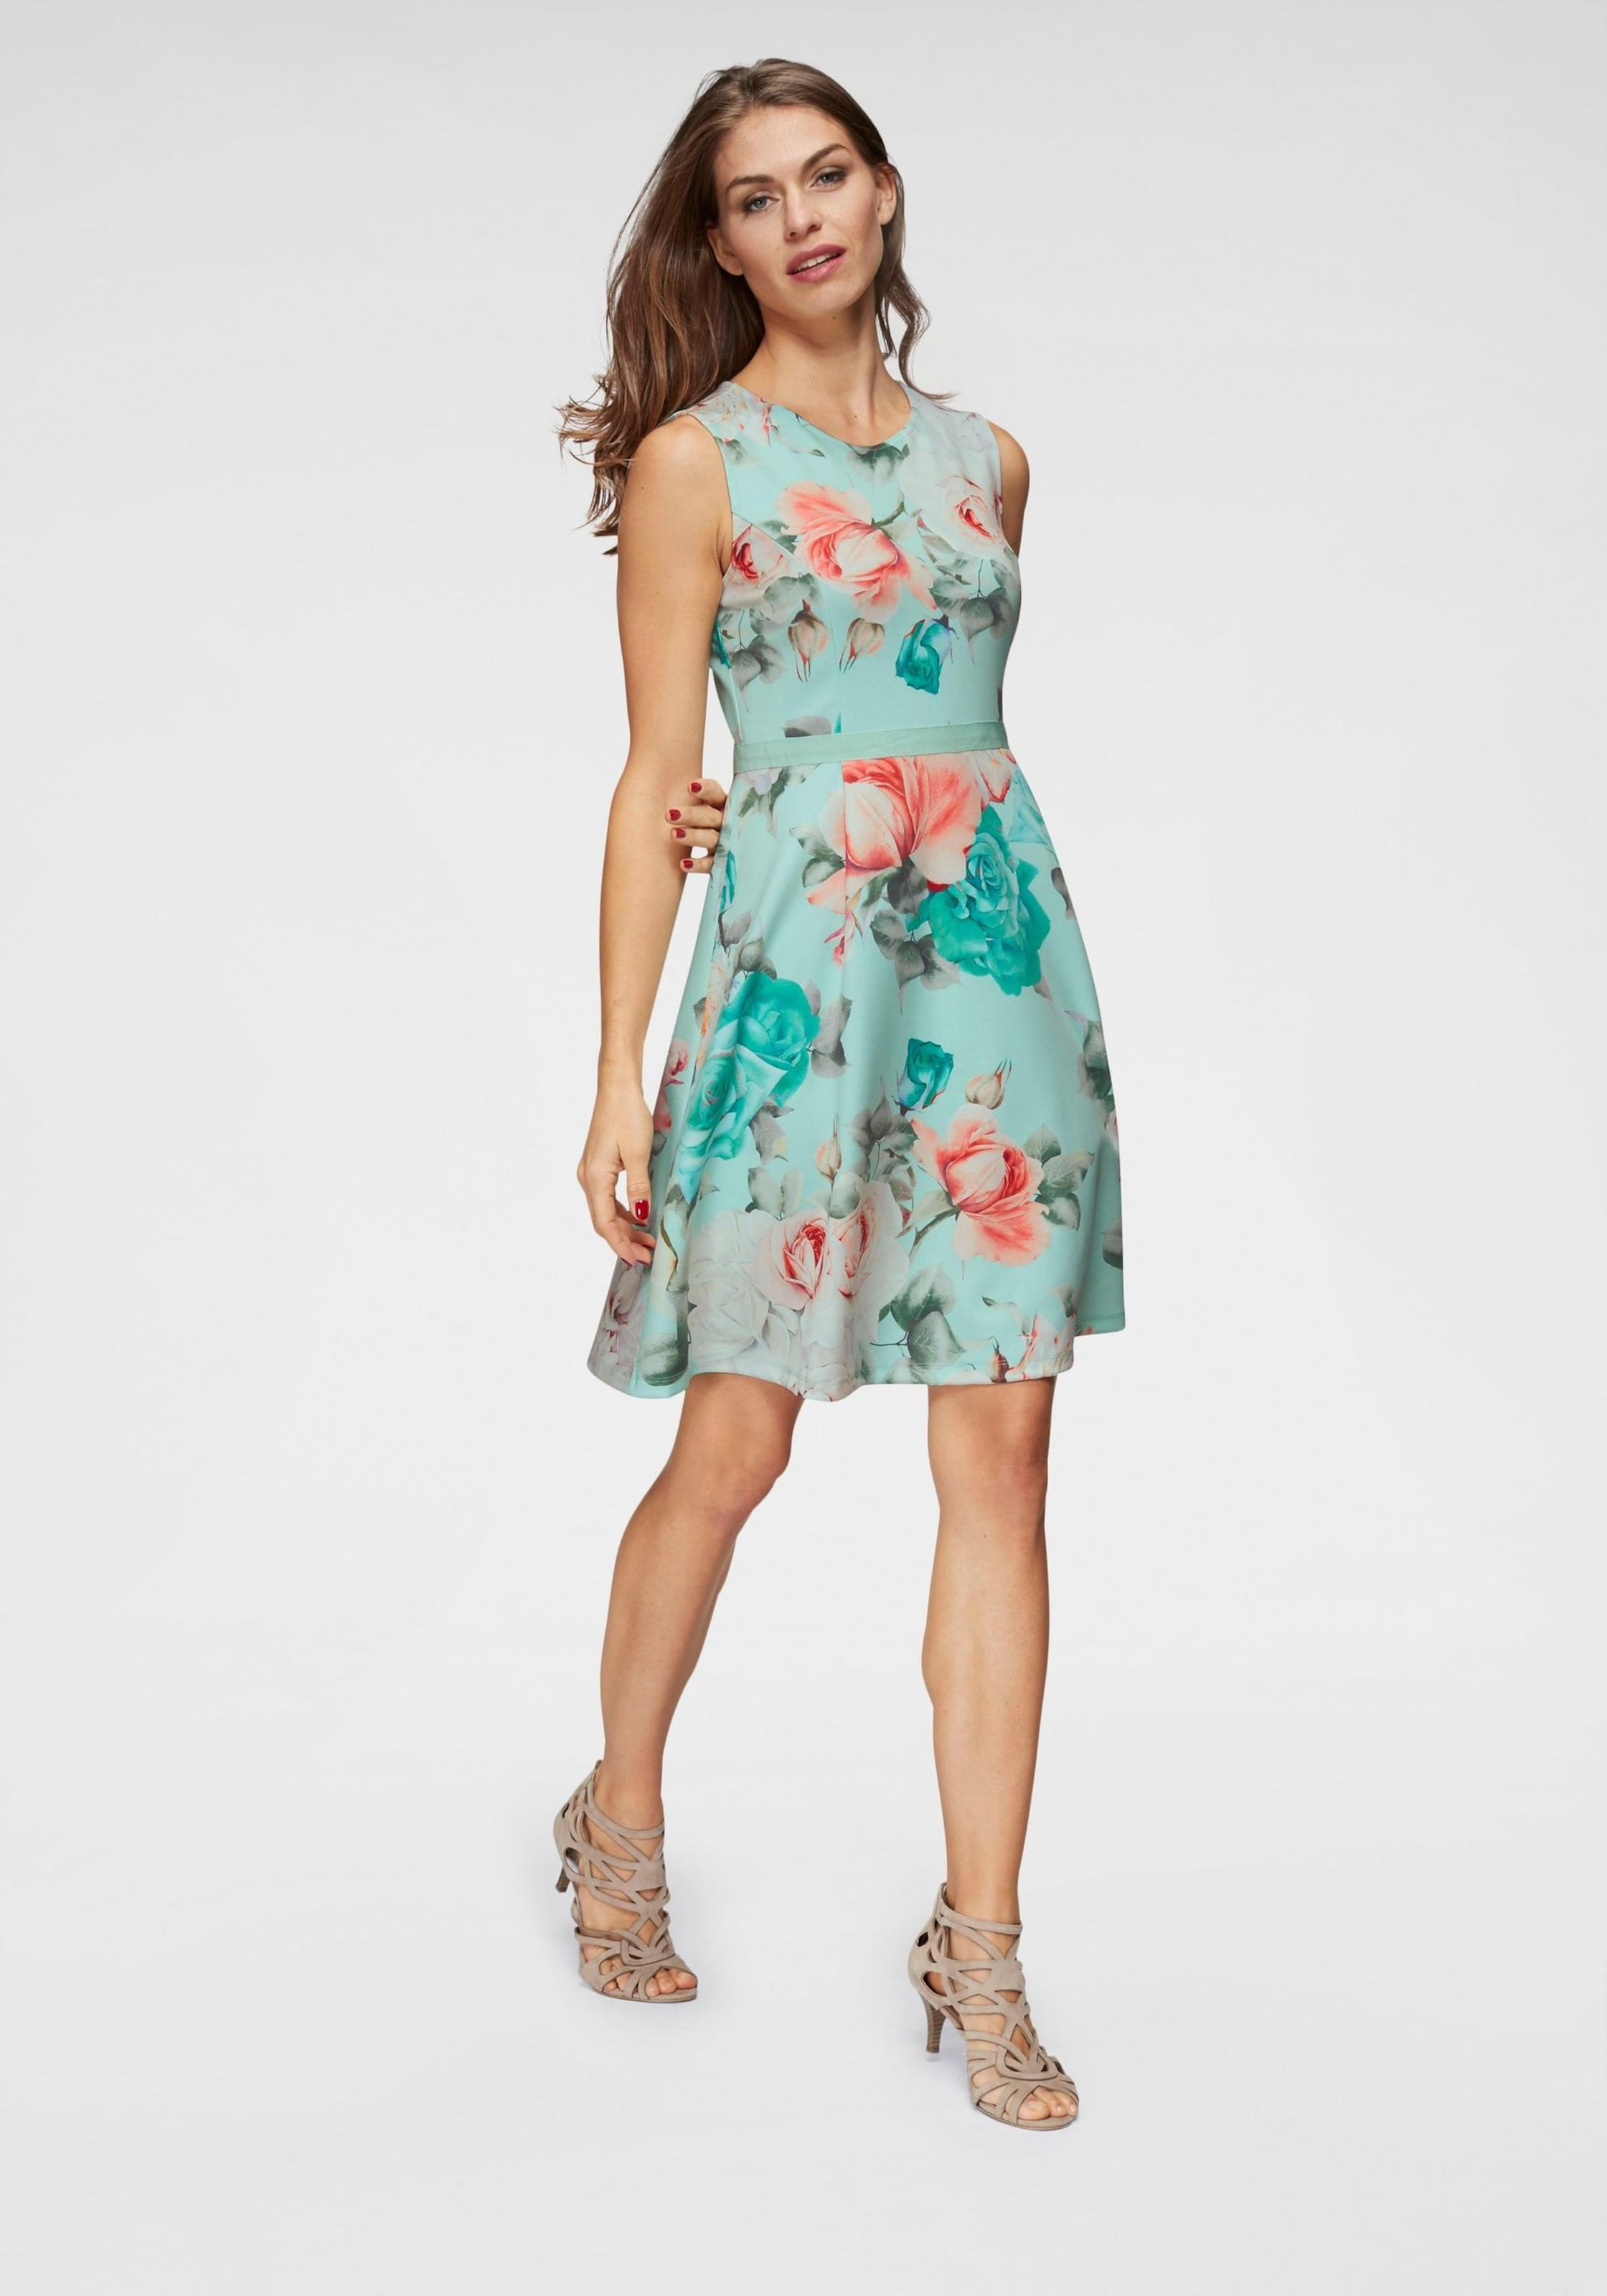 Kleid Vivance MintMischfarben Vivance MintMischfarben Kleid In Kleid In In MintMischfarben Vivance nv8yN0mwOP